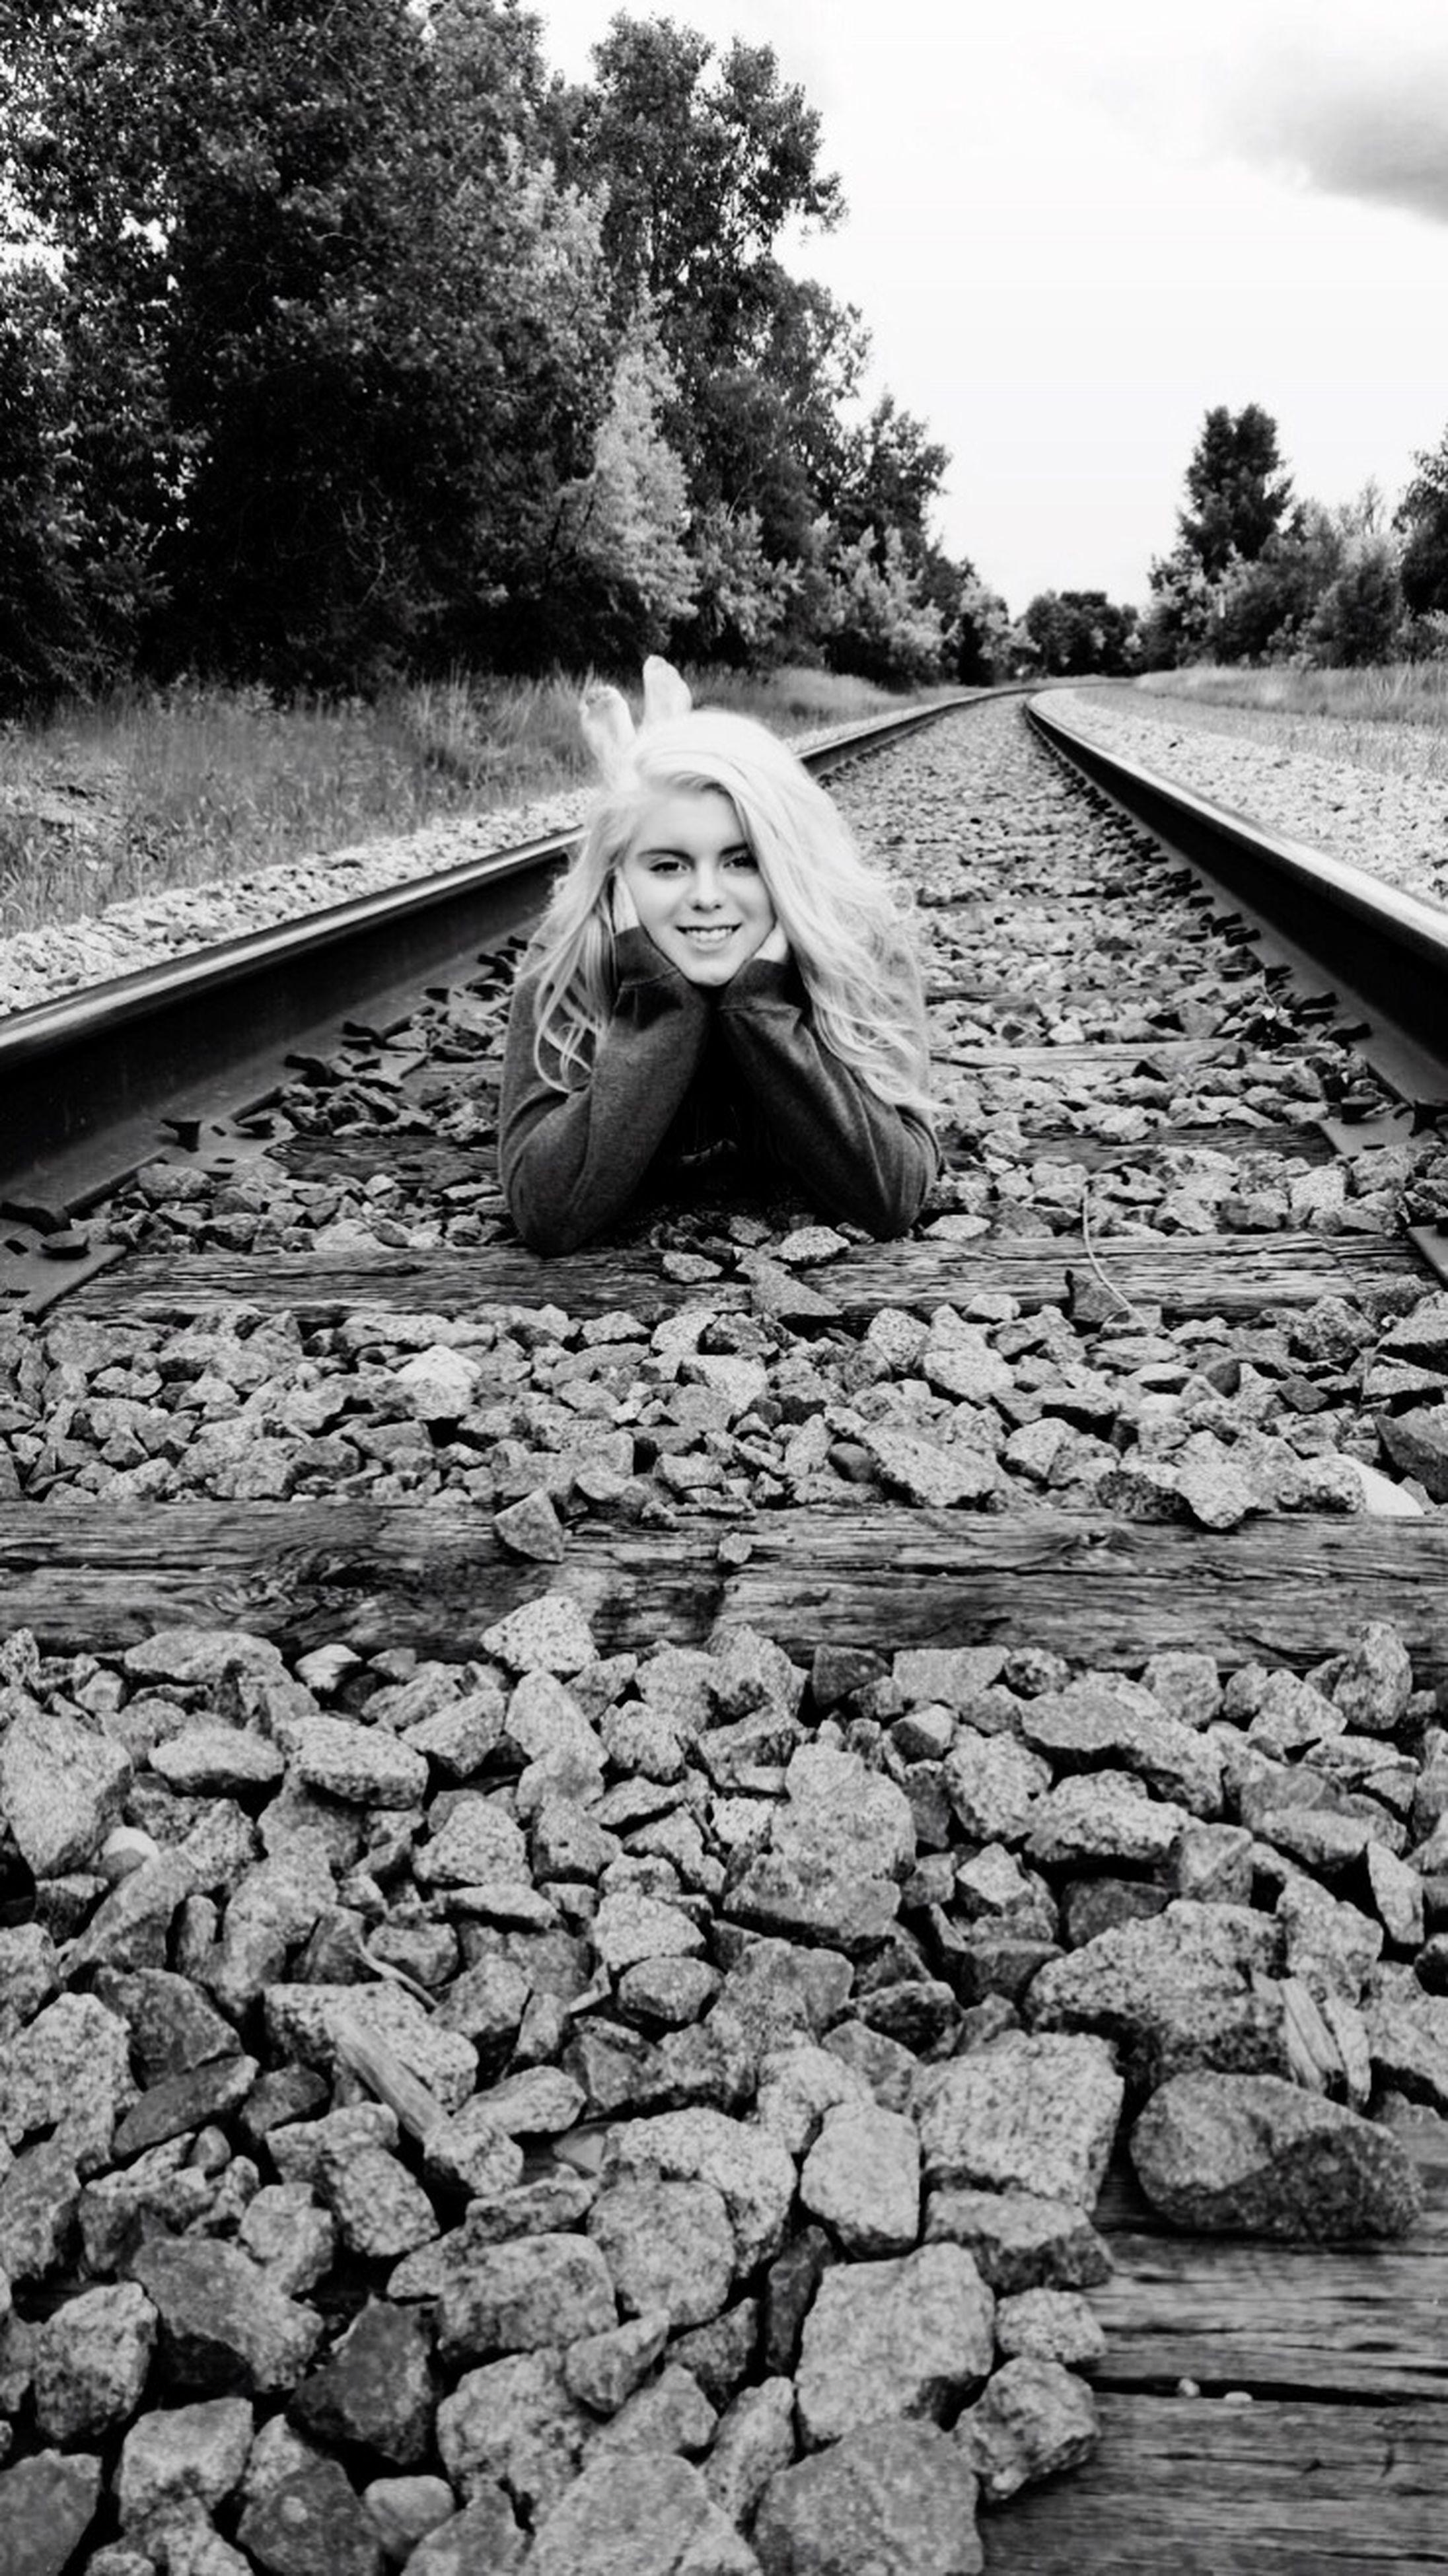 railroad track, transportation, rail transportation, mammal, day, animal themes, one animal, nature, no people, domestic animals, tree, outdoors, sky